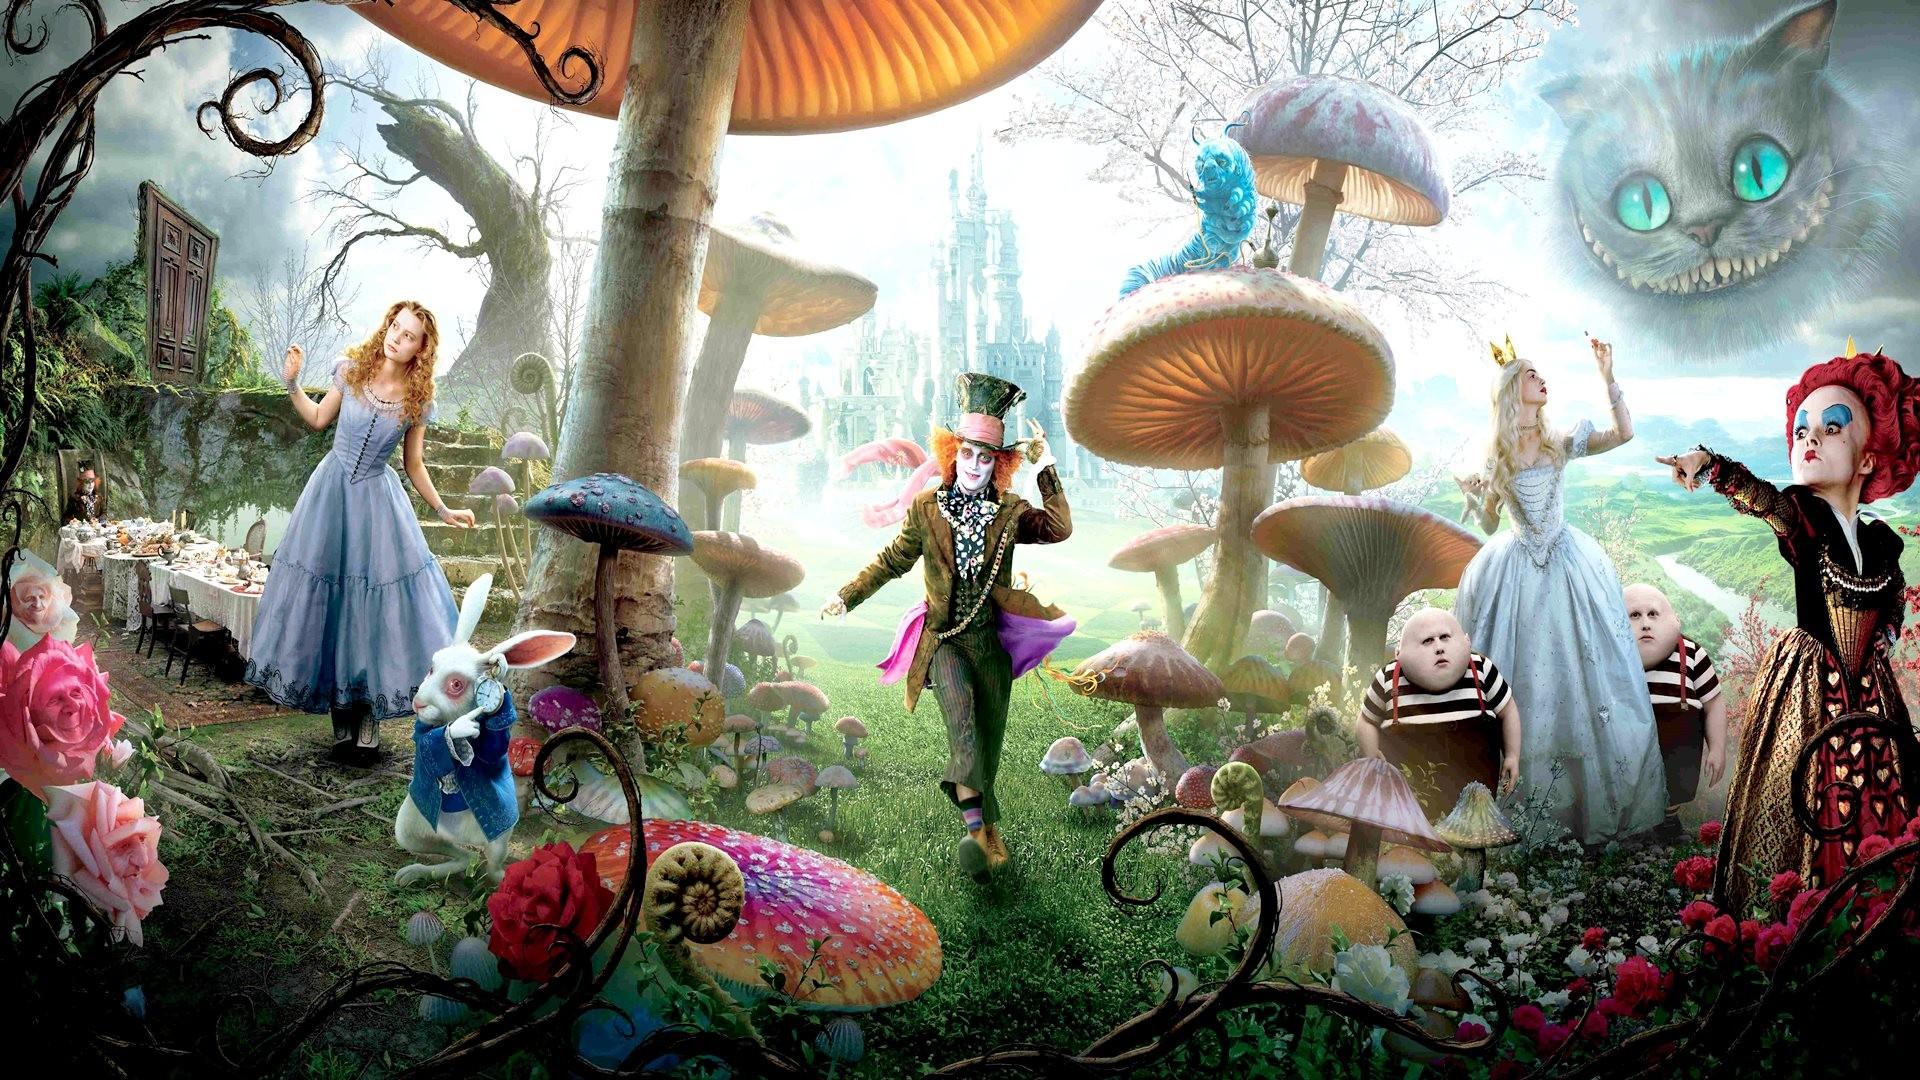 Trippy Alice In Wonderland Wallpaper 56 Images